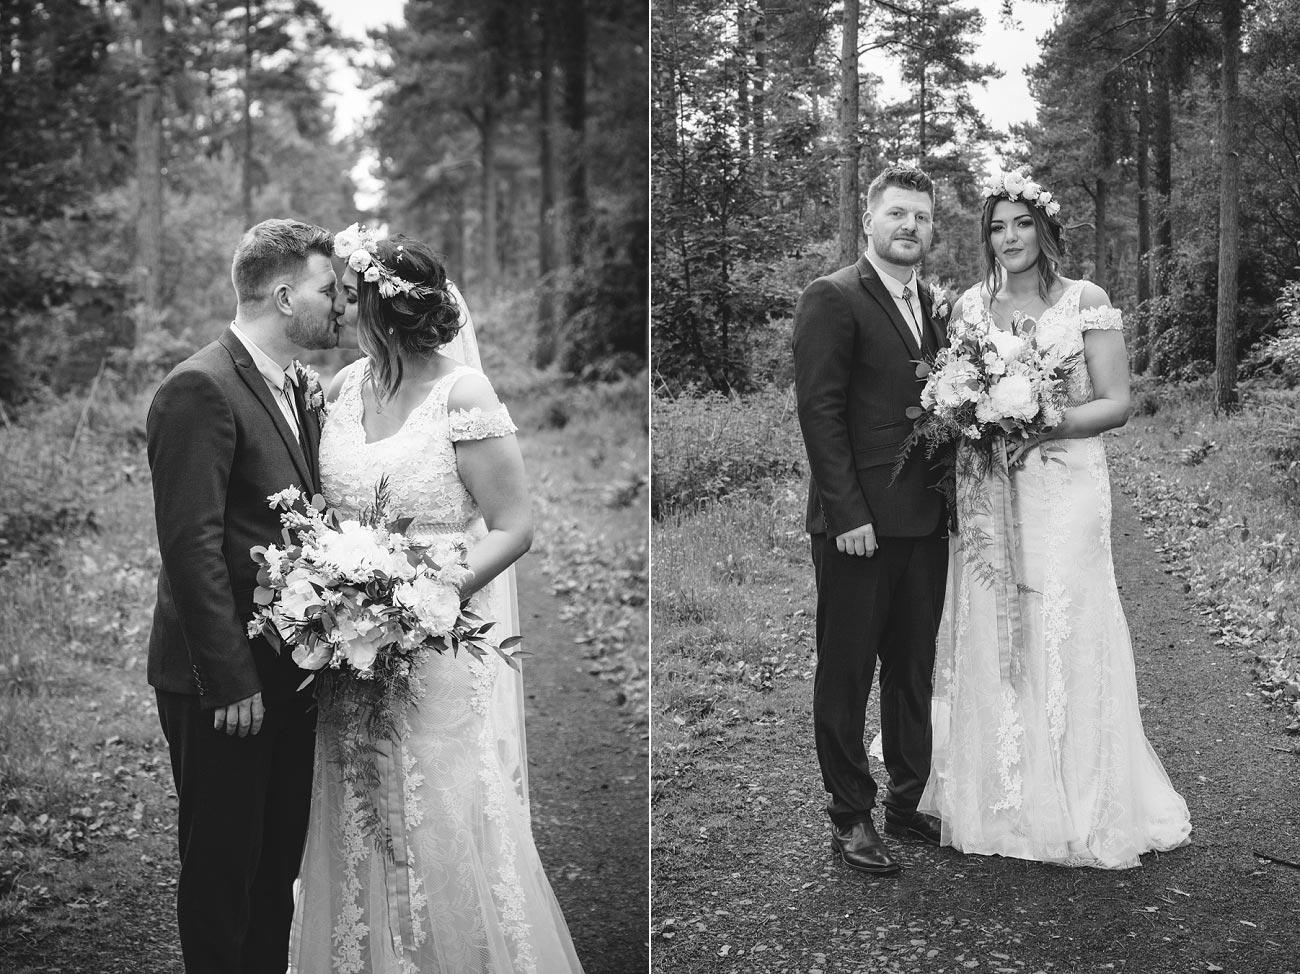 wedding photography fife letham village Hall scotland woodland vintage 0071